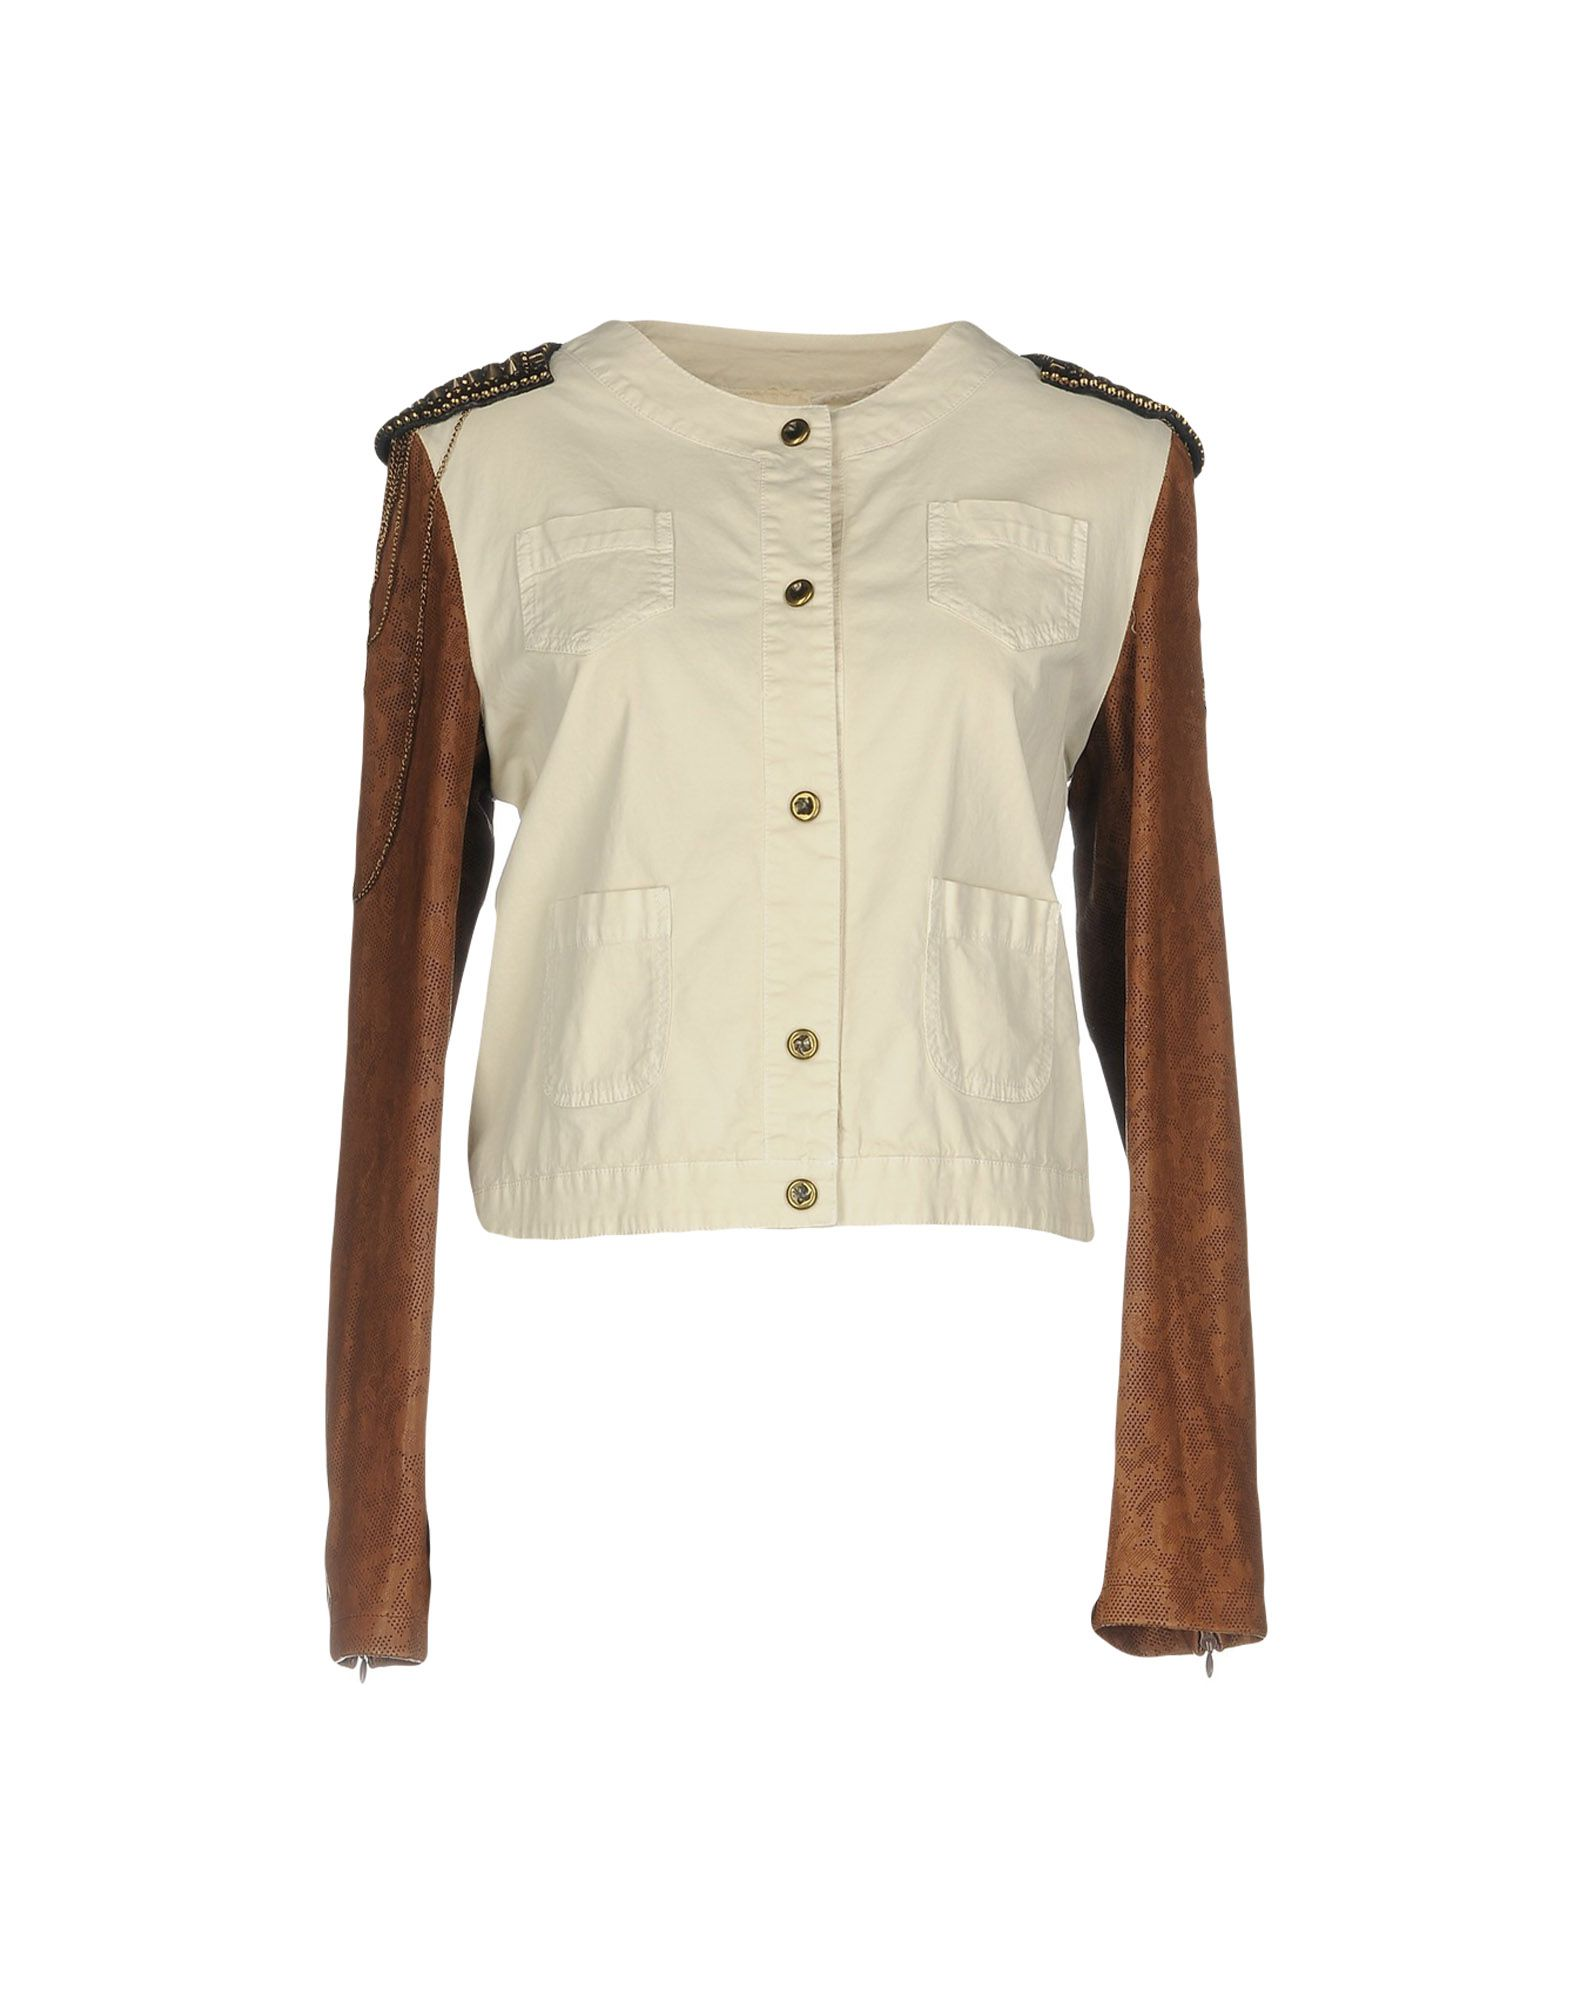 PROJECT -- [FOCE] -- SINGLESEASON -- Куртка project [foce] singleseason пиджак